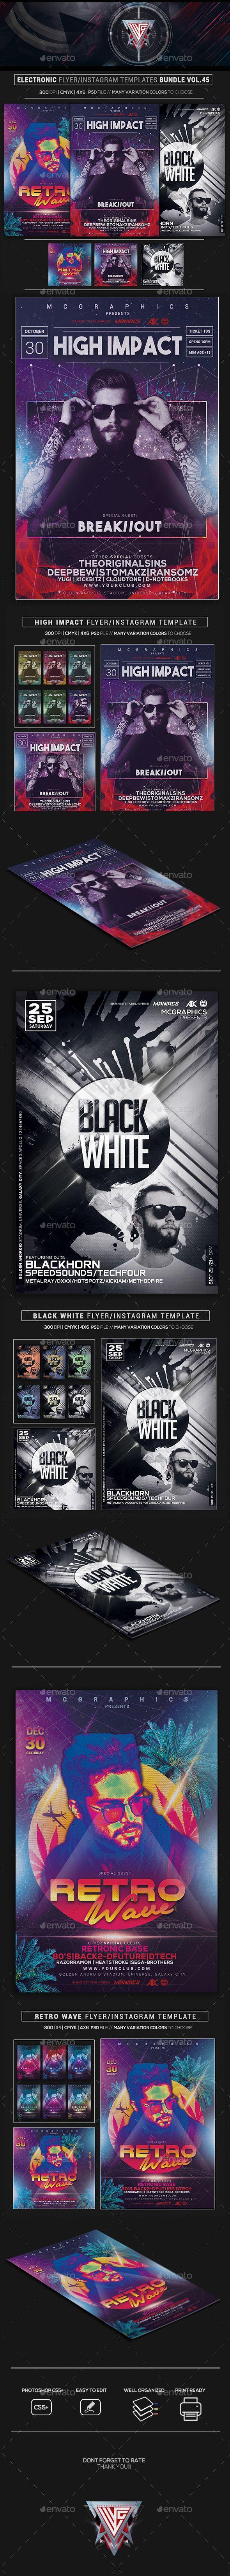 Electro #Music #Flyer/Instagram Bundle Vol. 45 - #Events Flyers Download here:  https://graphicriver.net/item/electro-music-flyerinstagram-bundle-vol-45/20339227?ref=alena994